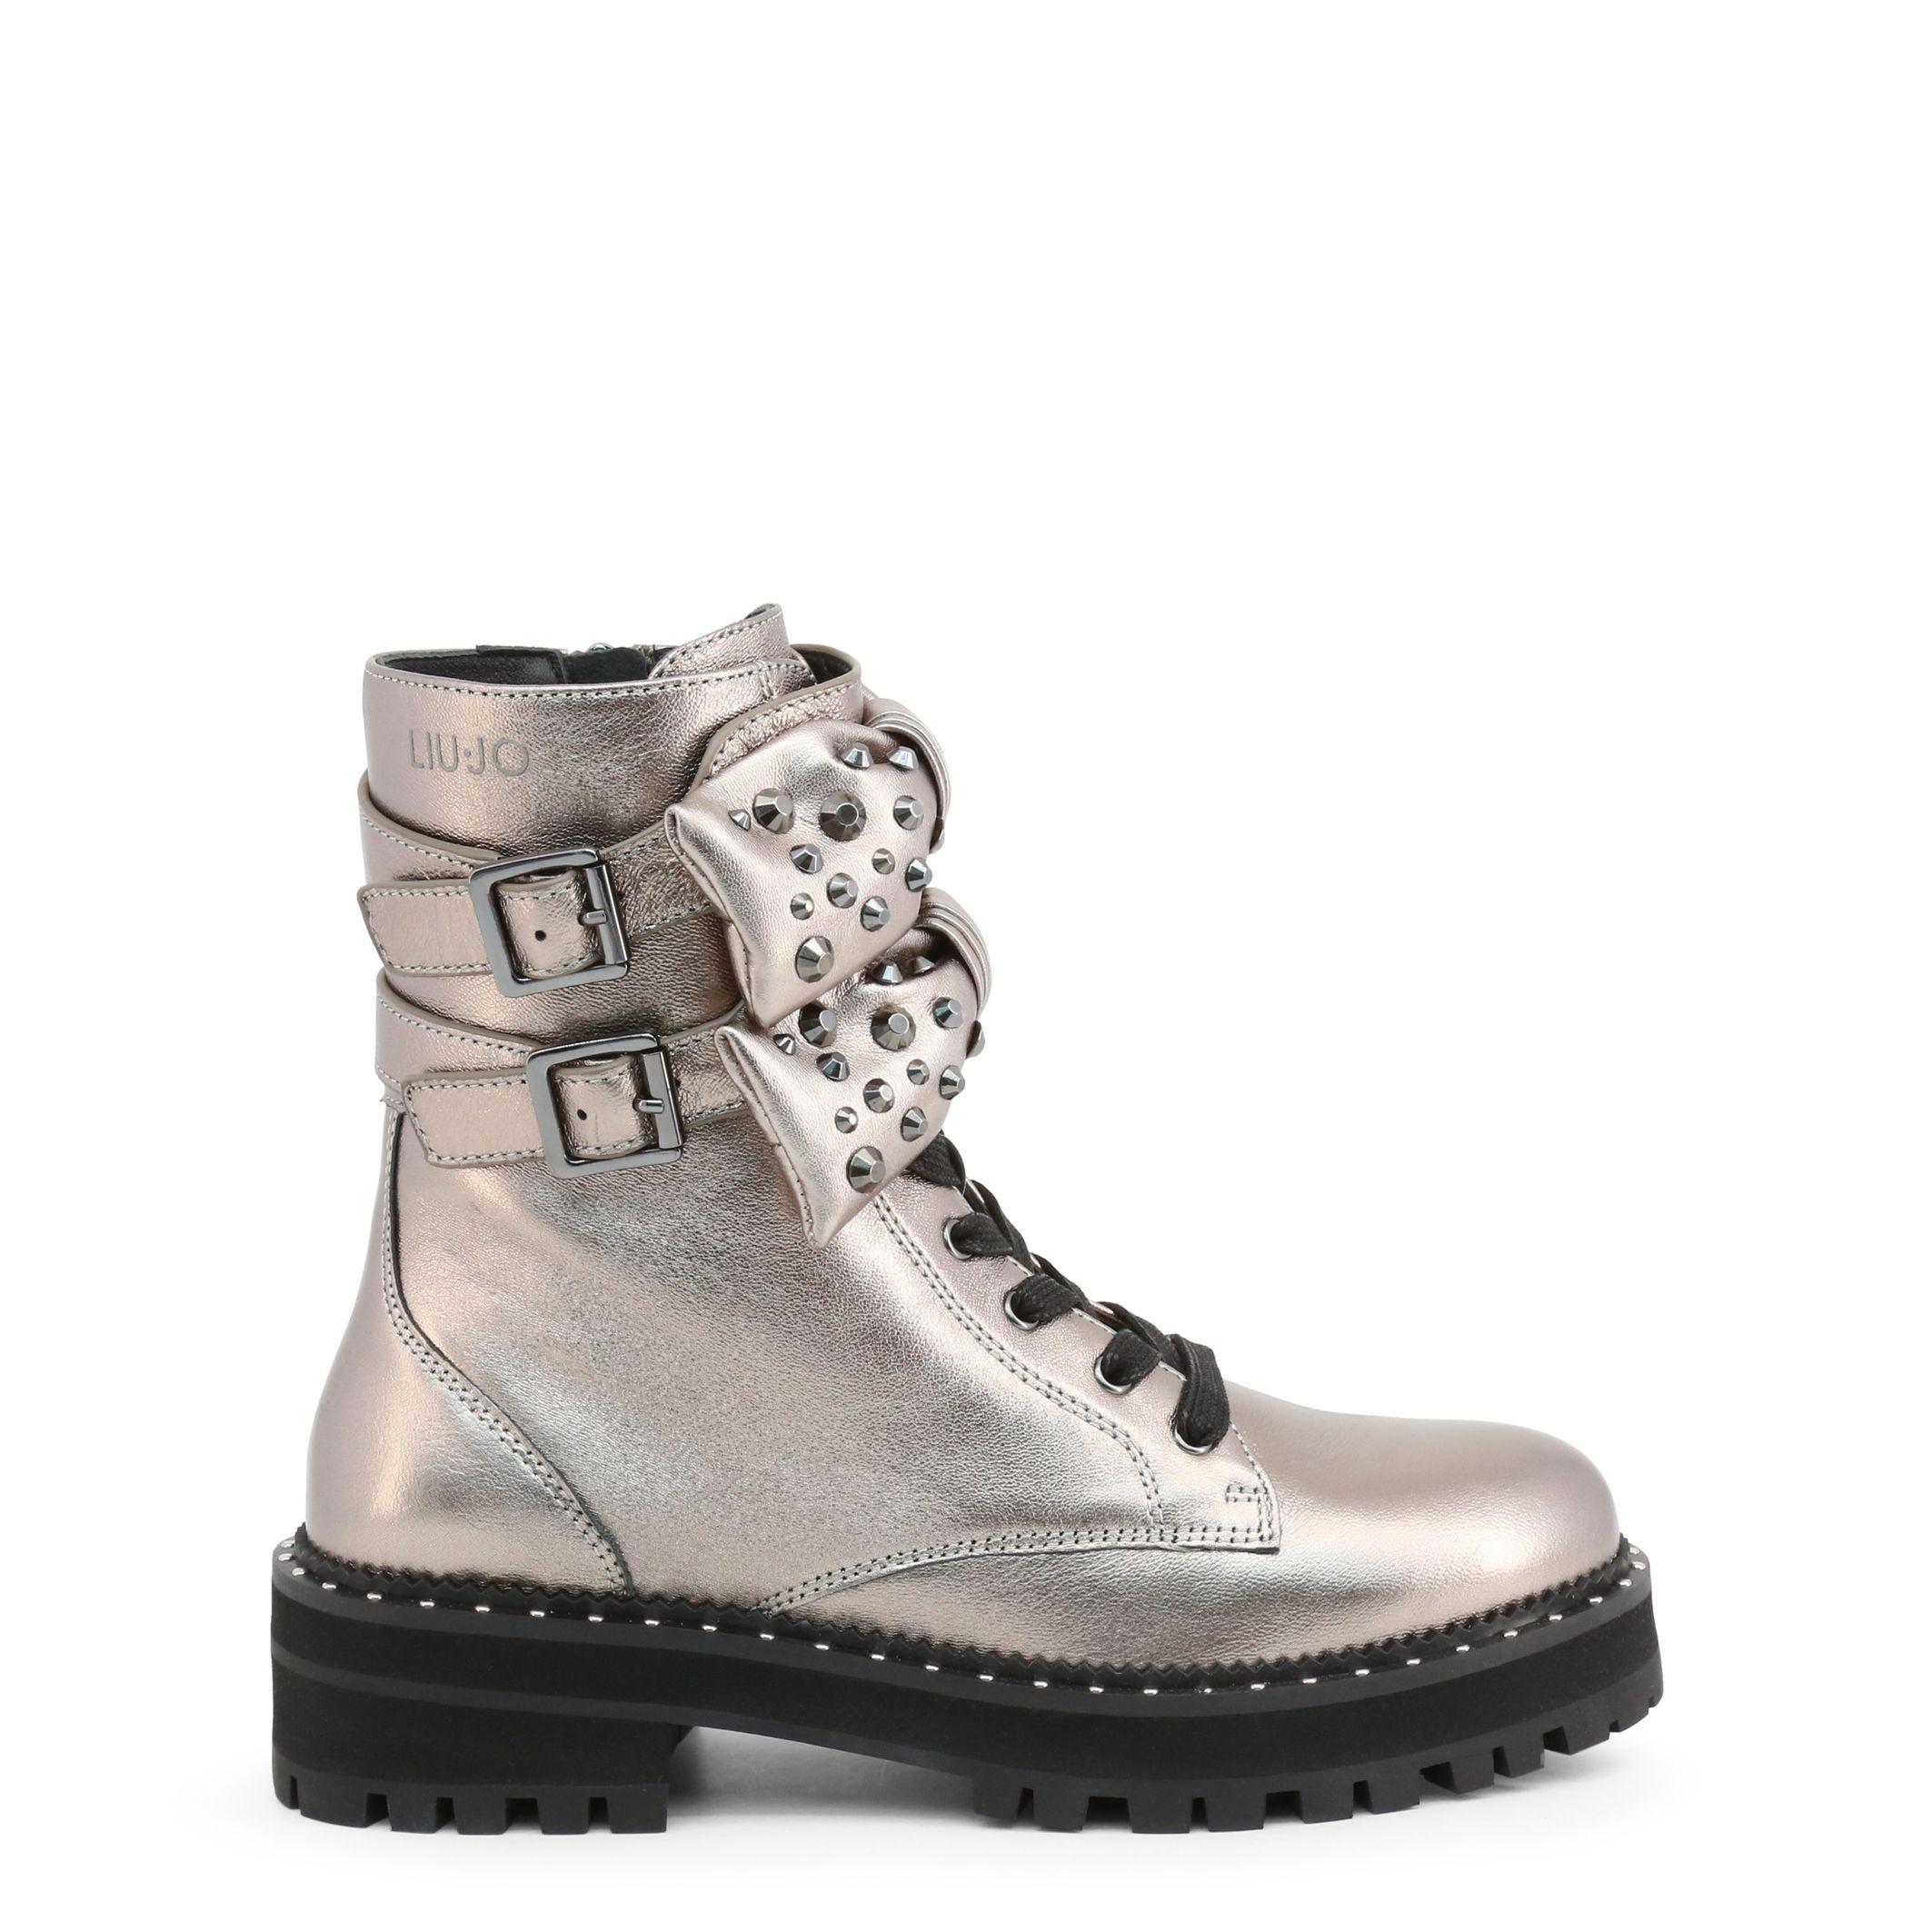 Schuhe Xti – 49272 – Grün